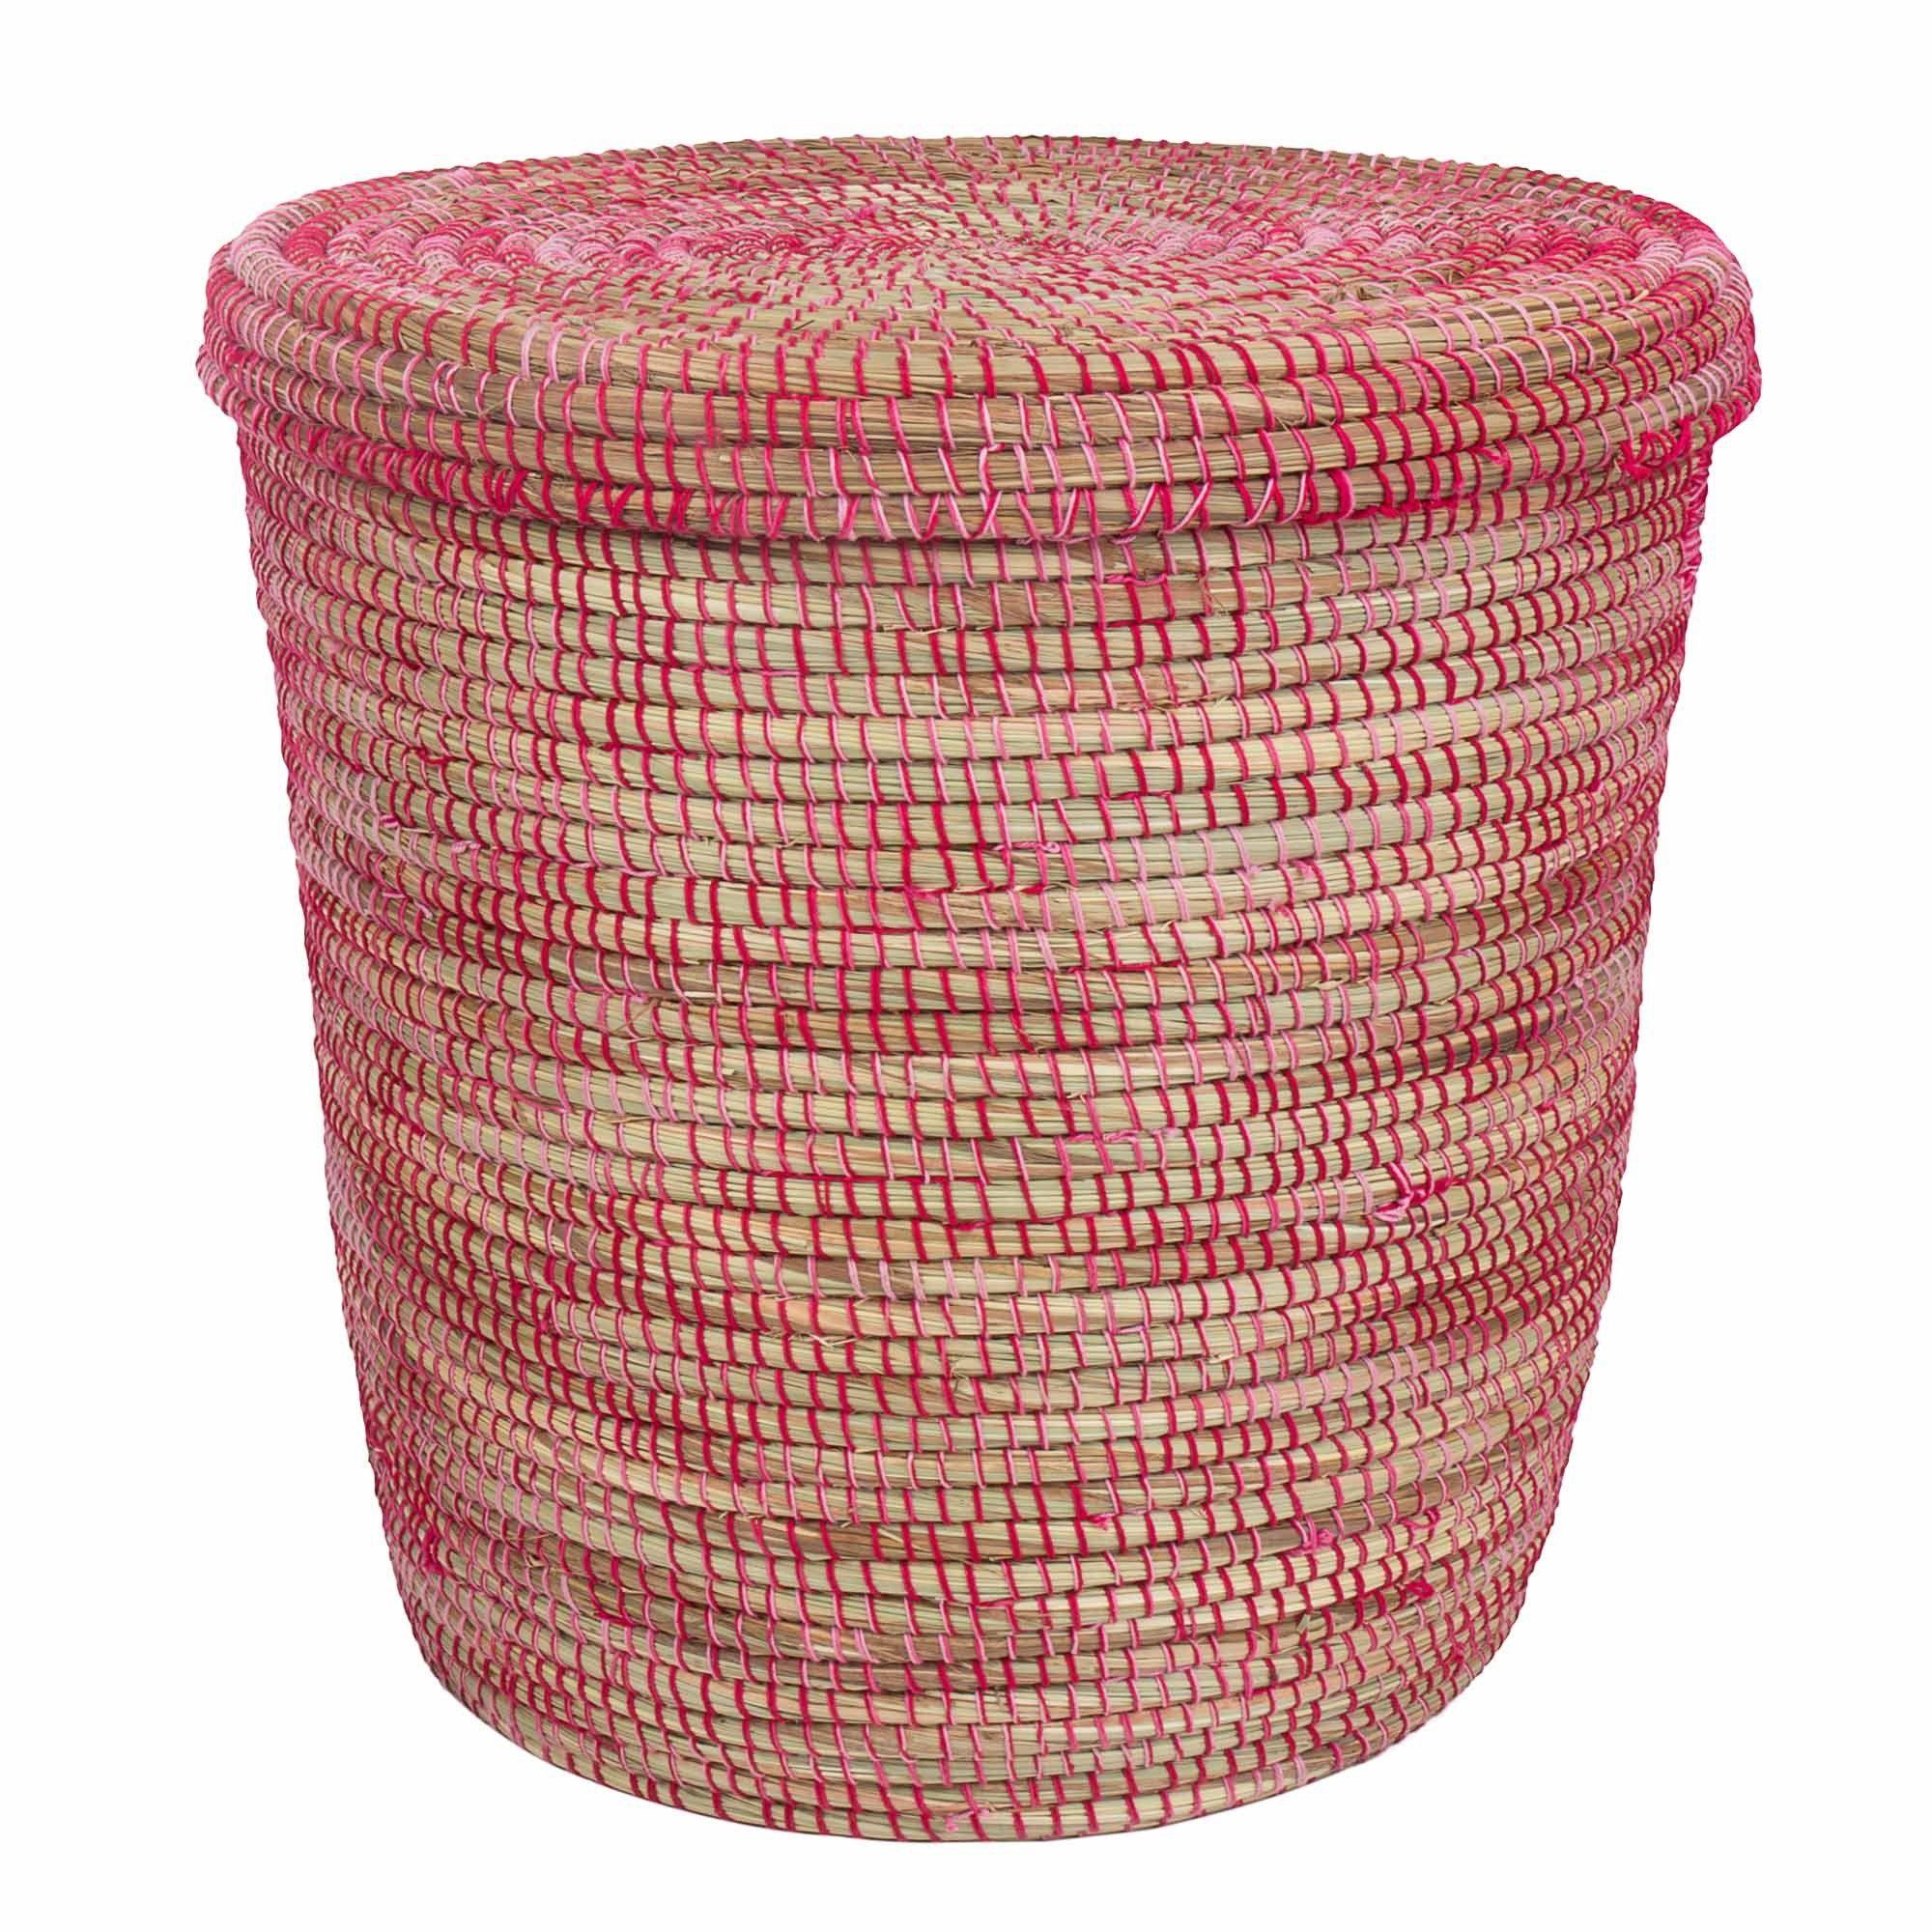 Kaedi Basket Natural Red Amp Amp Pink Basket Wicker Laundry